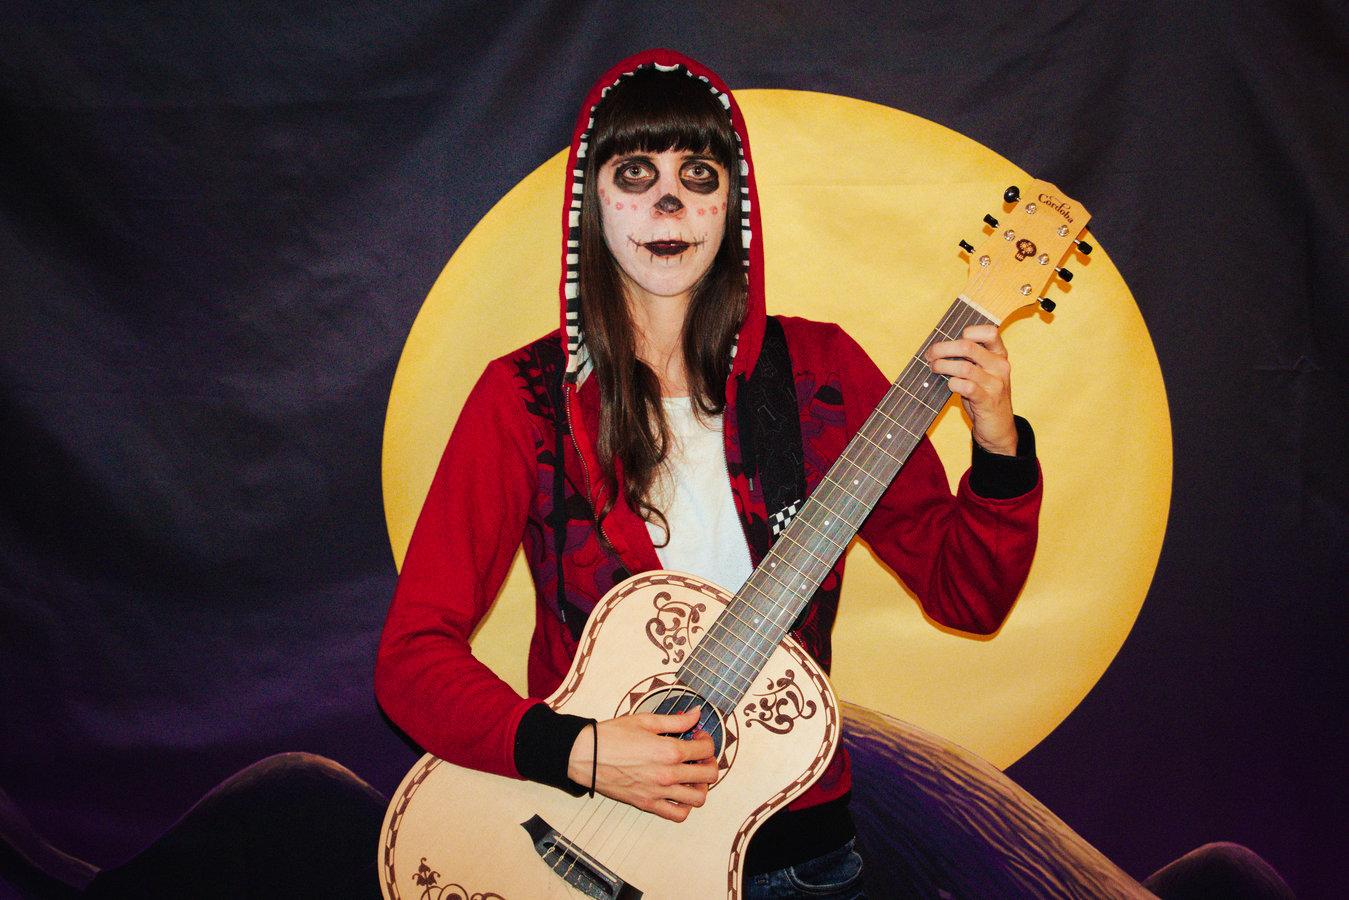 Miguel Coco costume